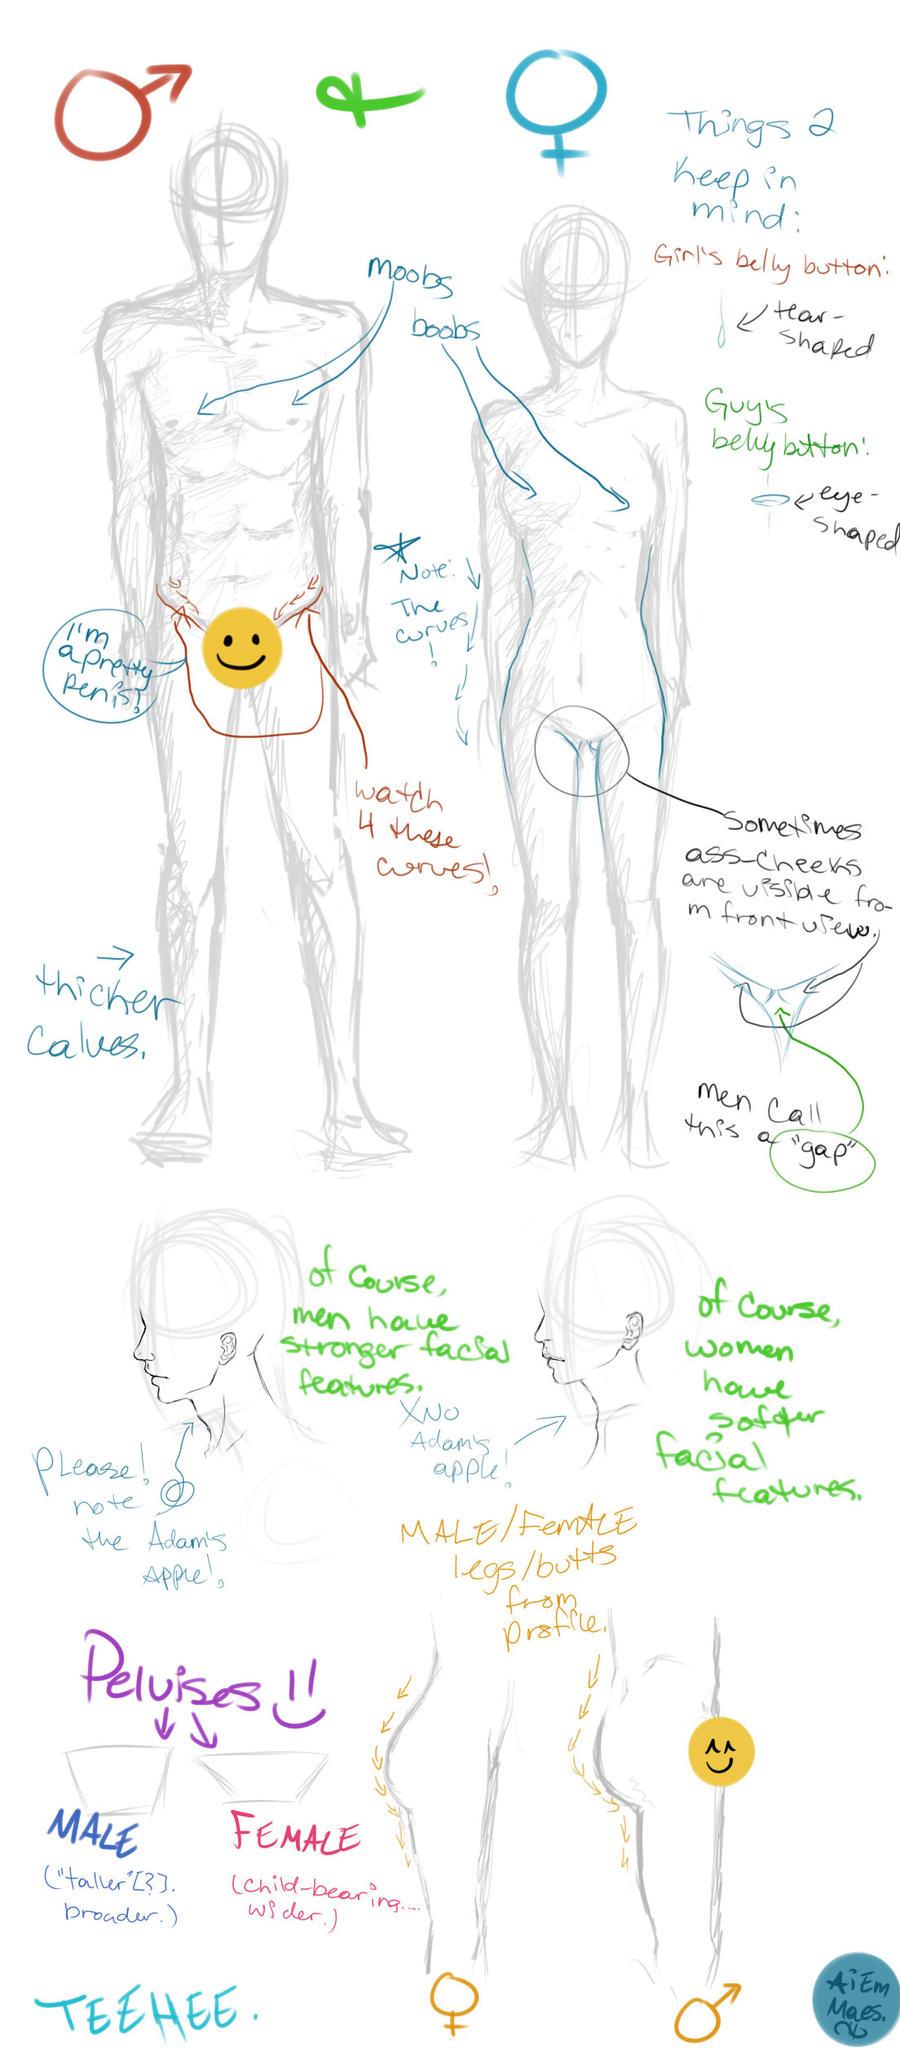 Male vs Female anatomy by wiccimm on DeviantArt